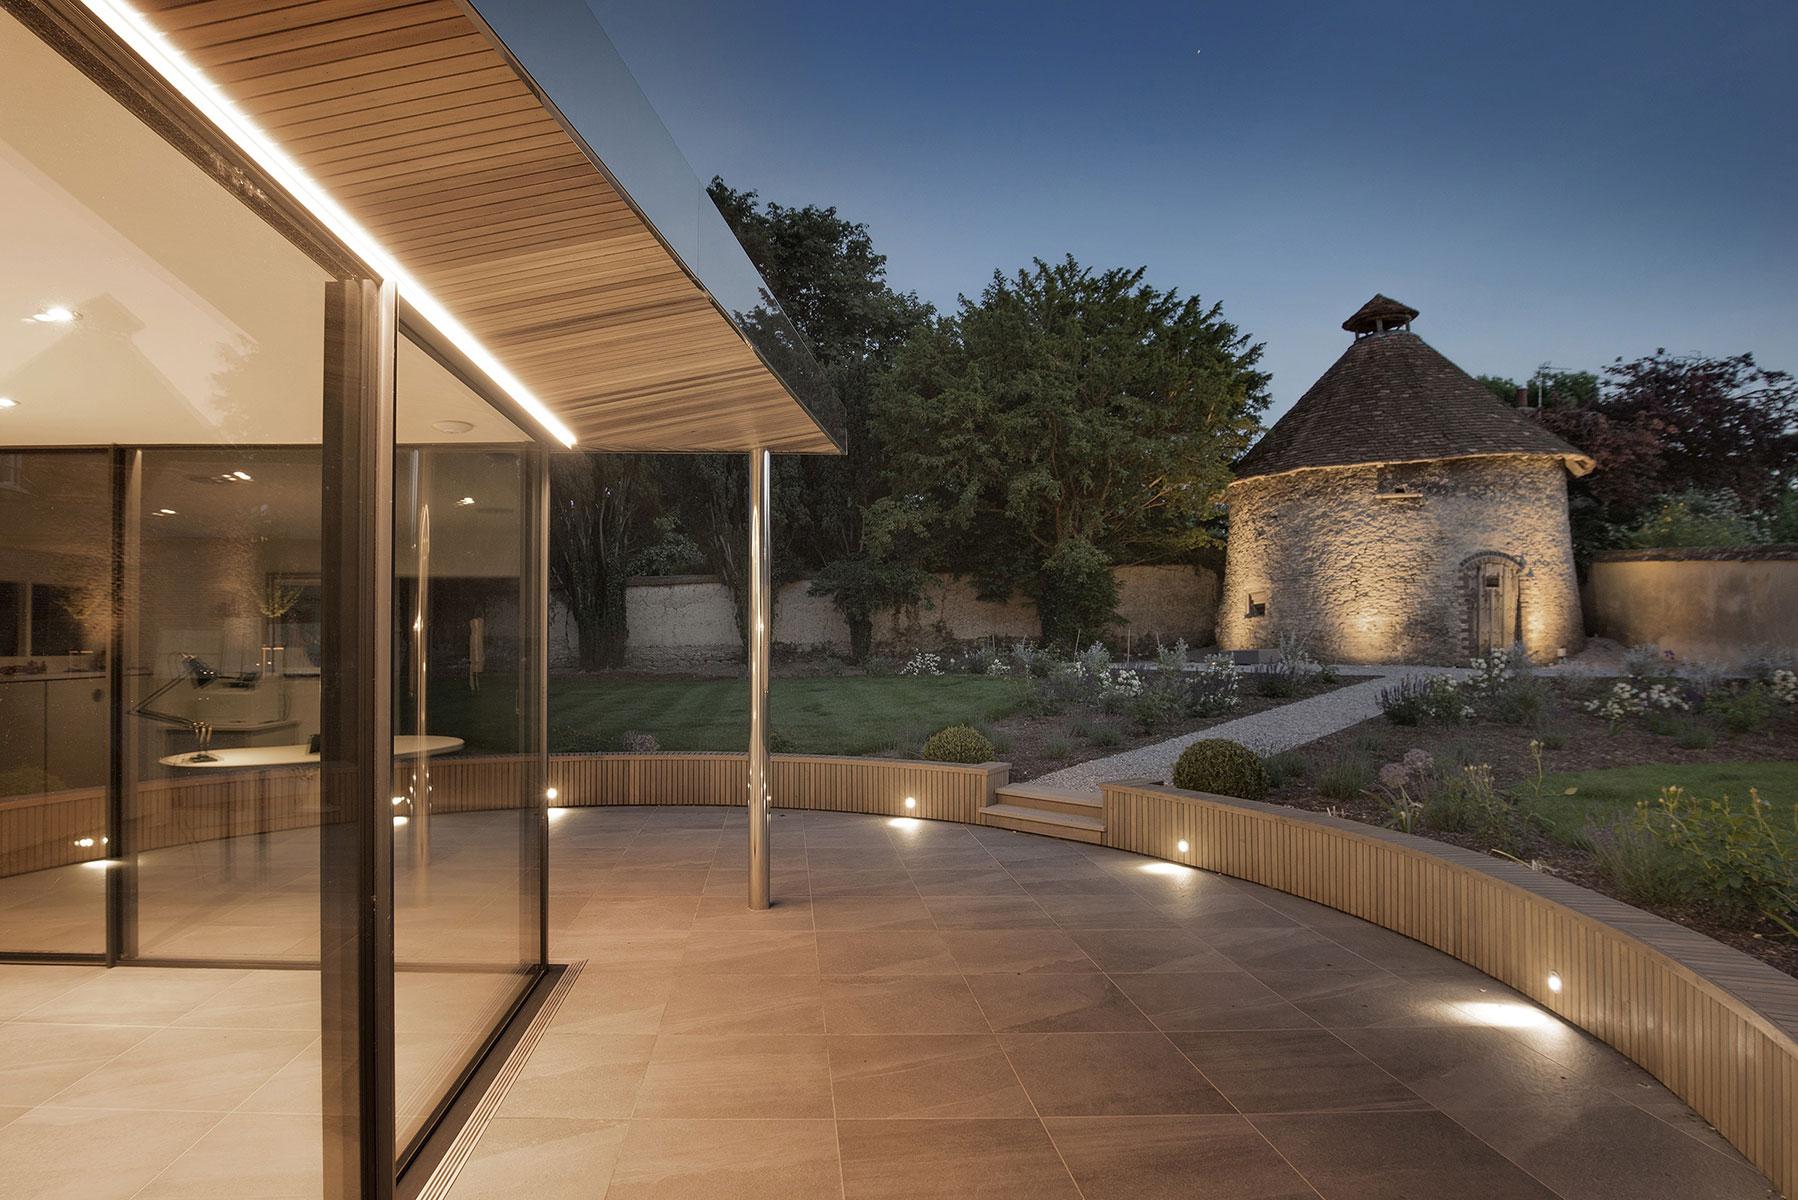 Award Winning Transformation Ian Slater Architectural